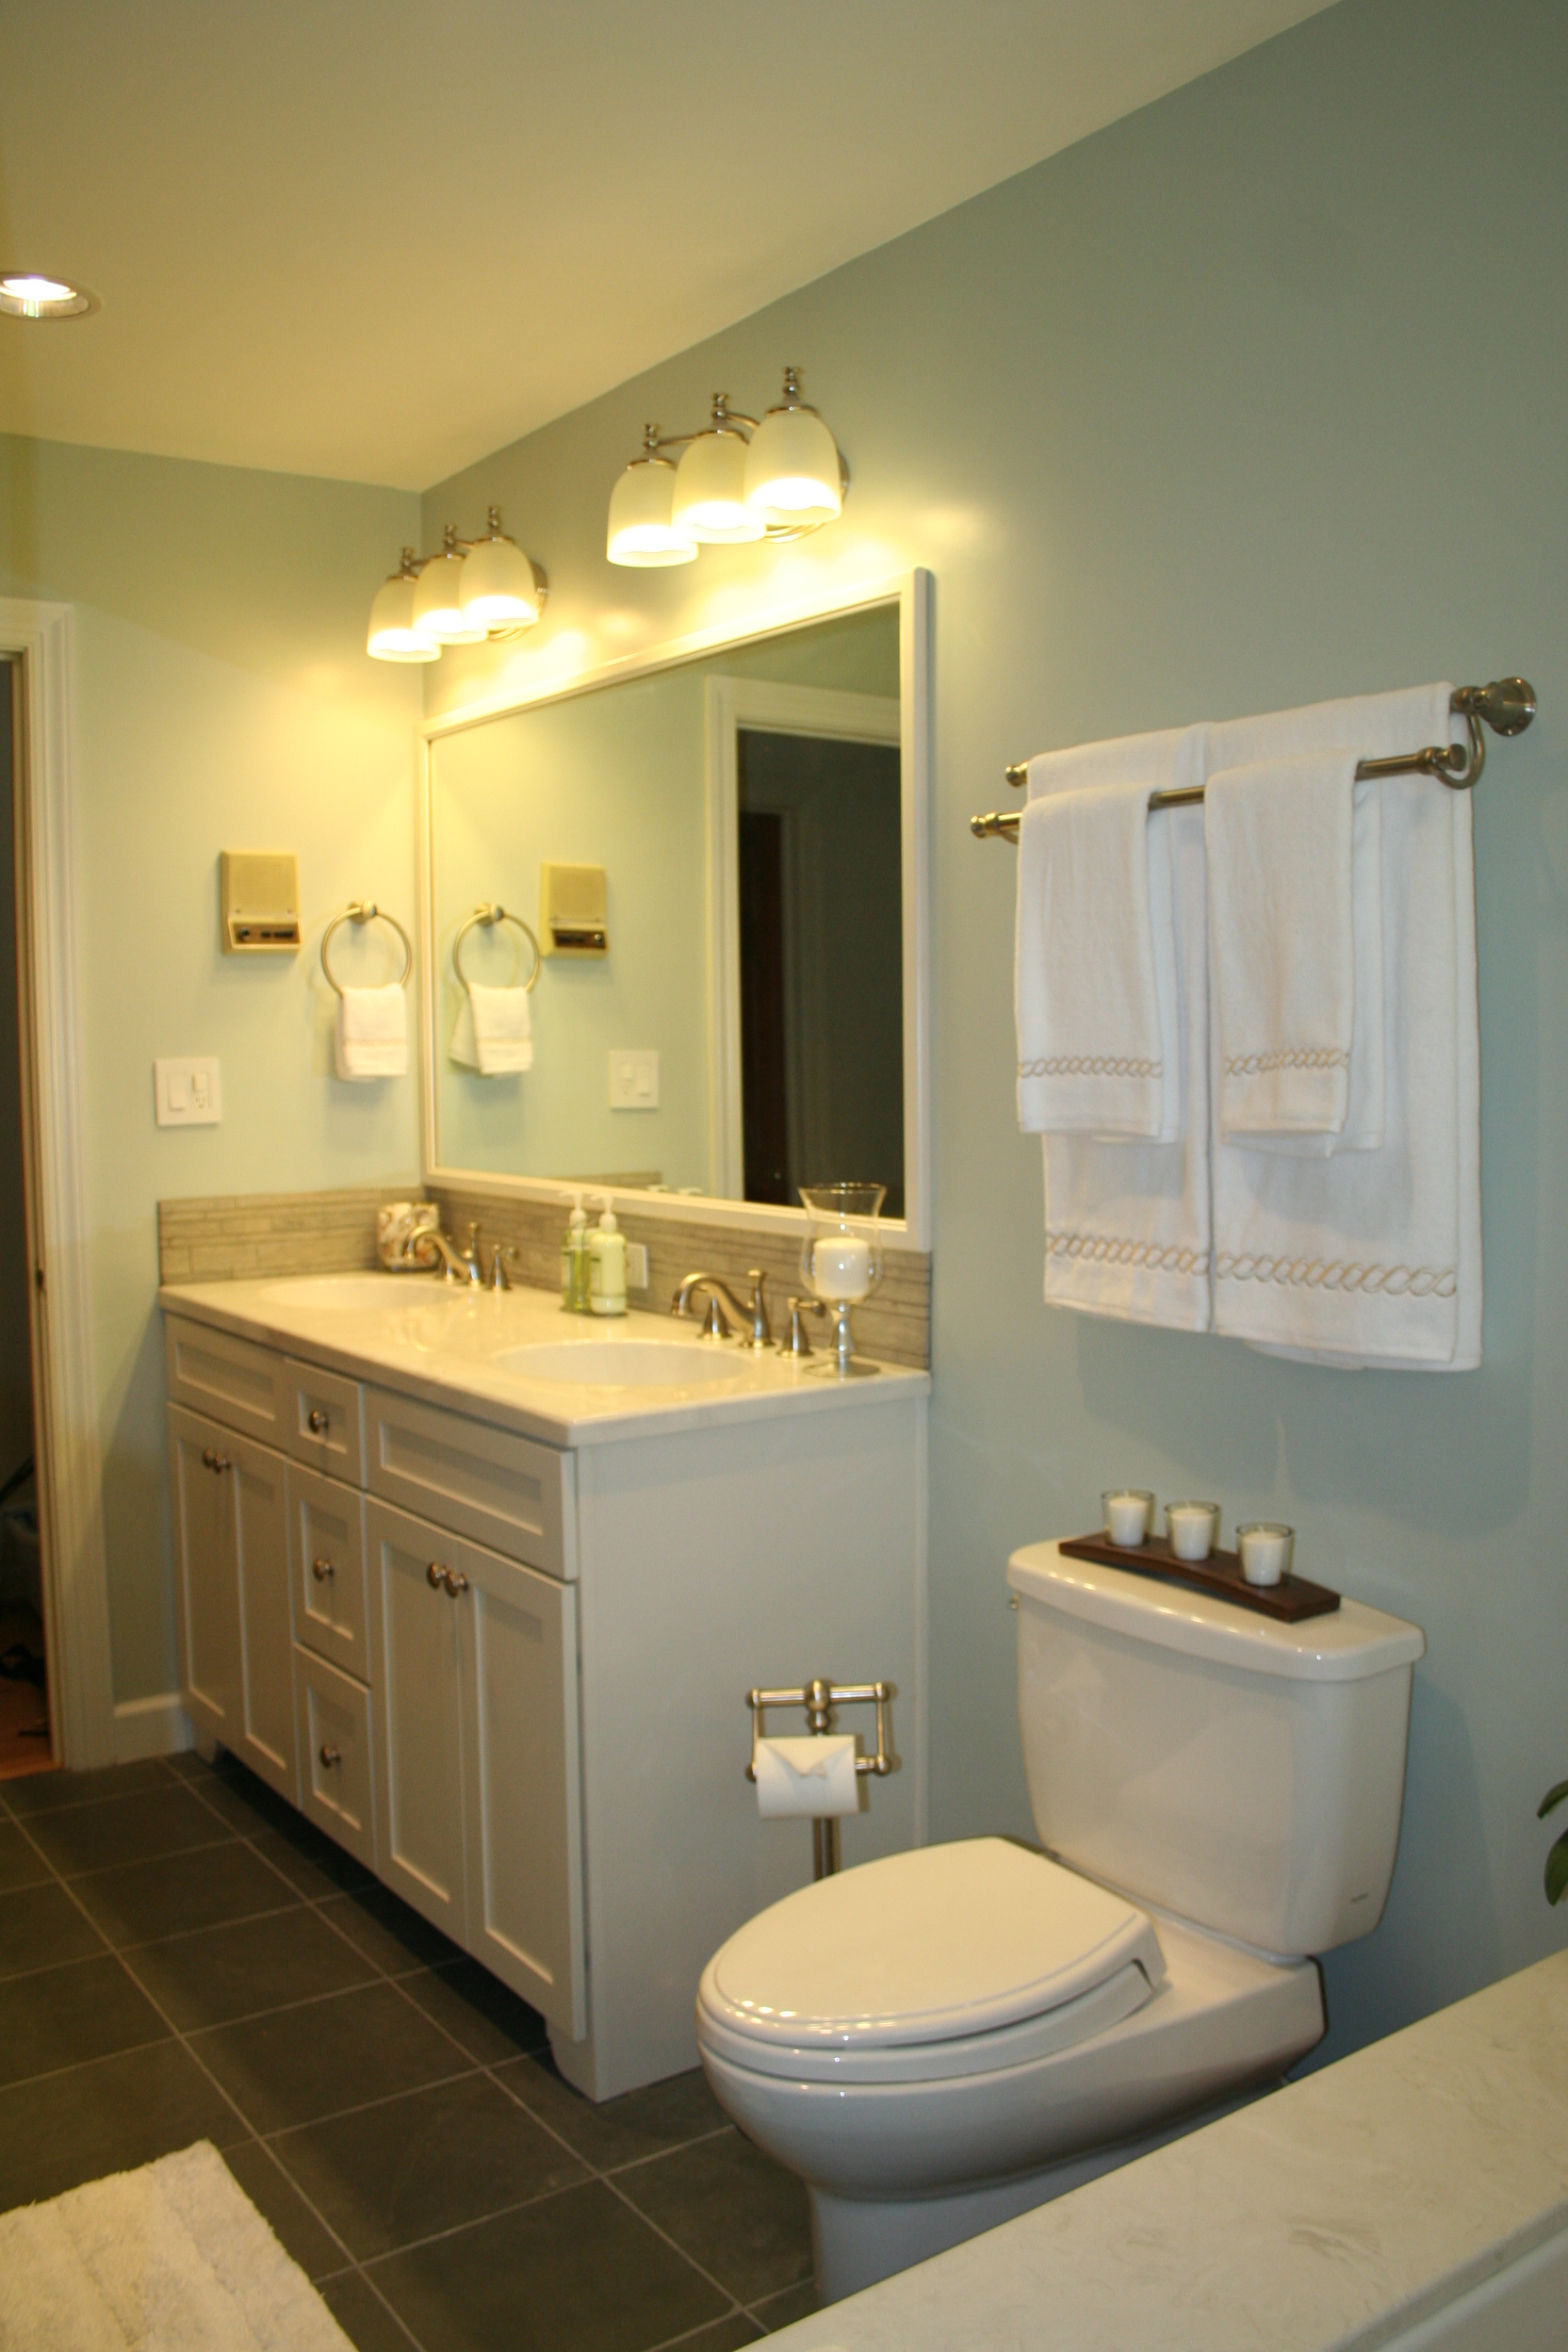 Virginia Beach GA Bathroom Remodel - Remodel Republic